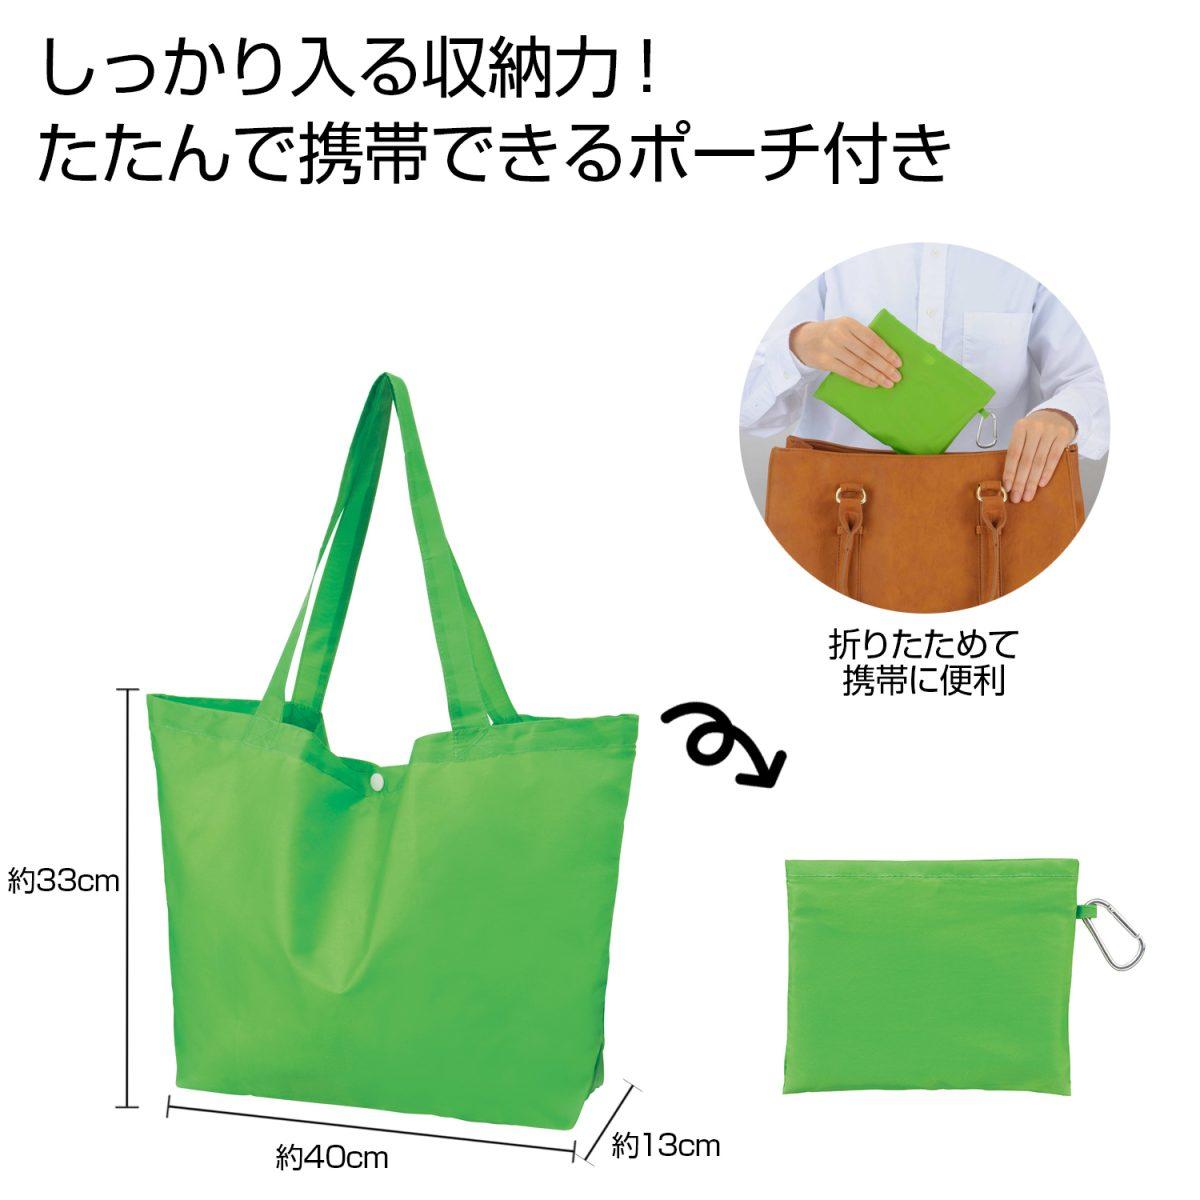 Ecolor 折りたたみビッグバッグ(グリーン)